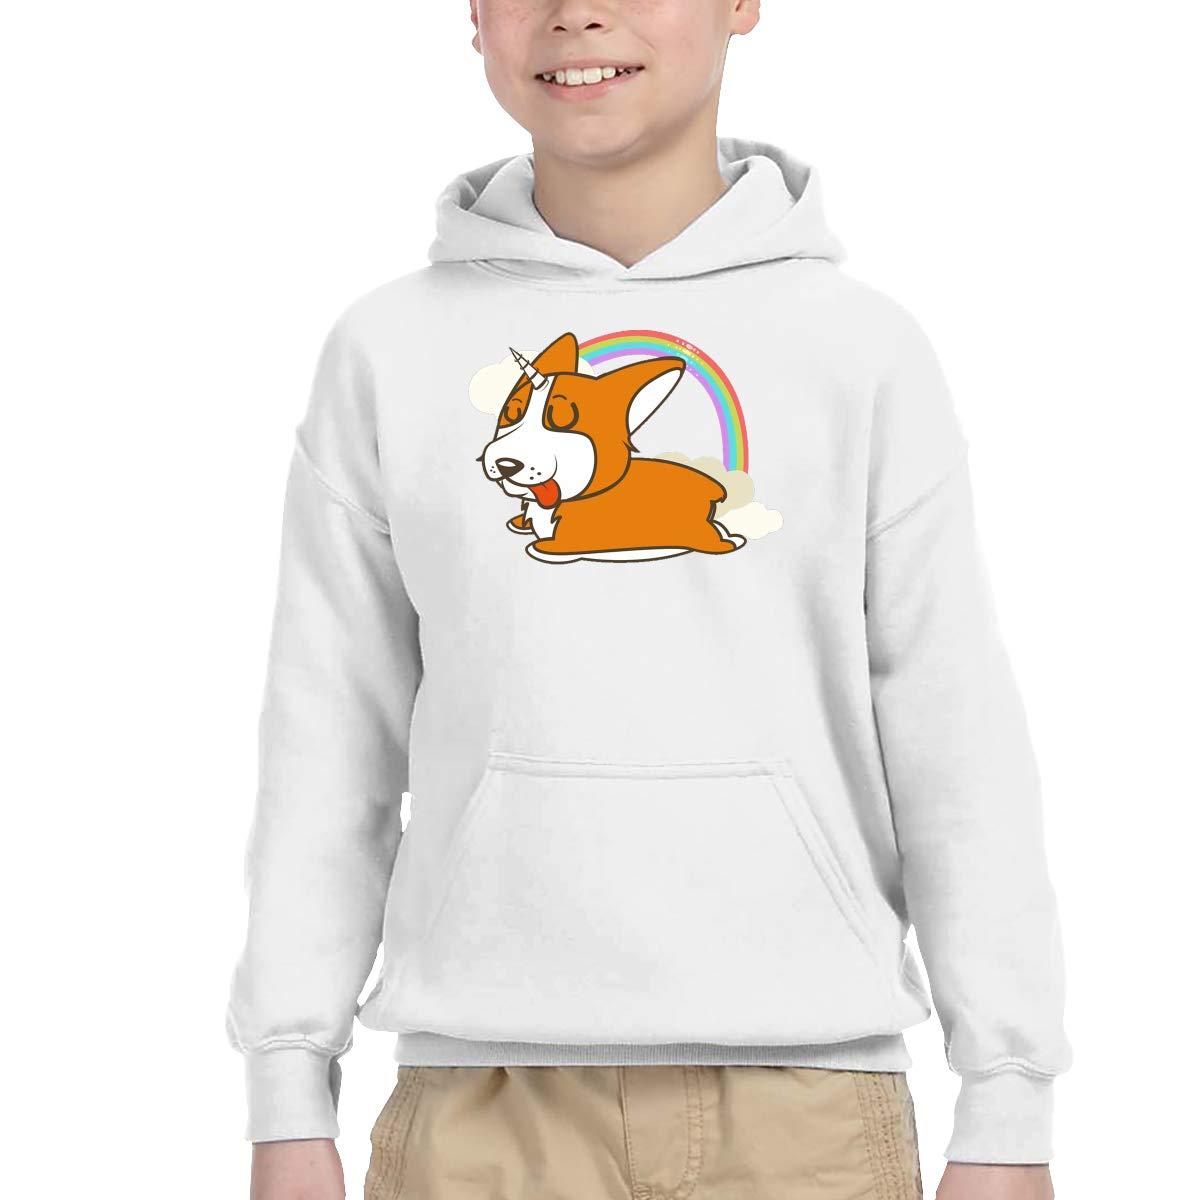 Sakanpo Corgi Dog Unicorn Pullover Hoodie Sweatshirt Teens Hooded for Boys Girls